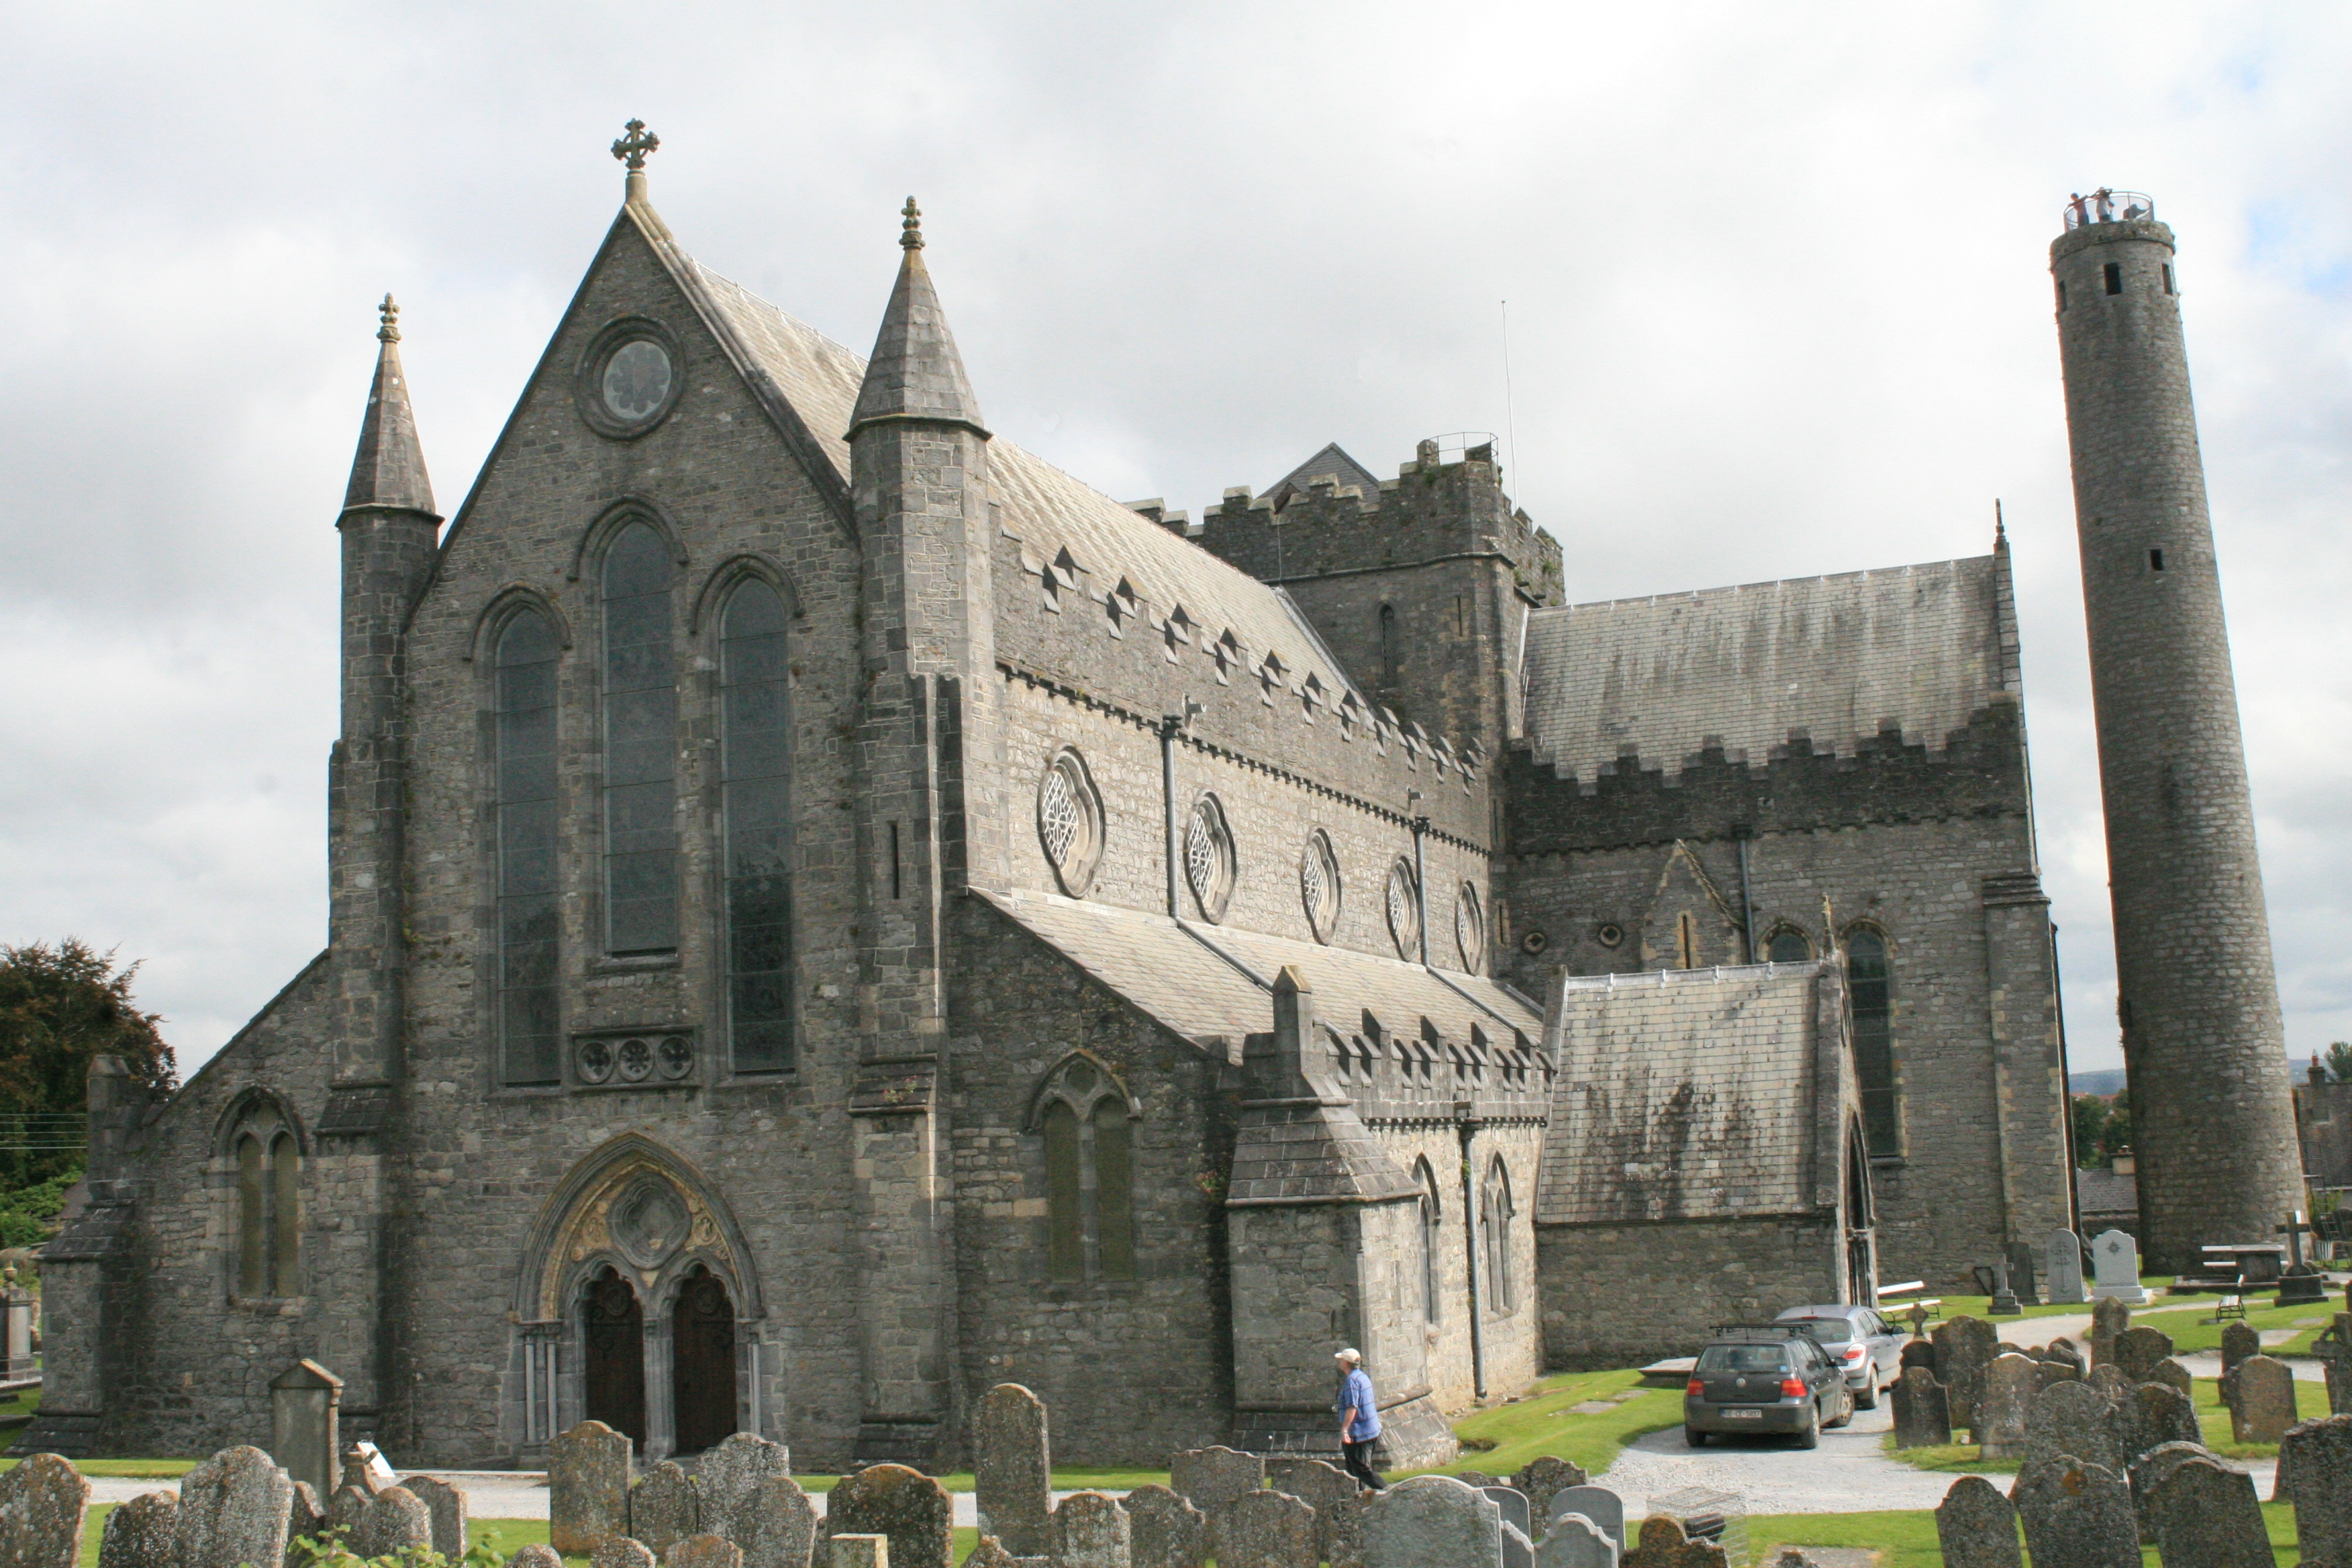 Online Chat & Dating in Kilkenny | Meet Men & Women in